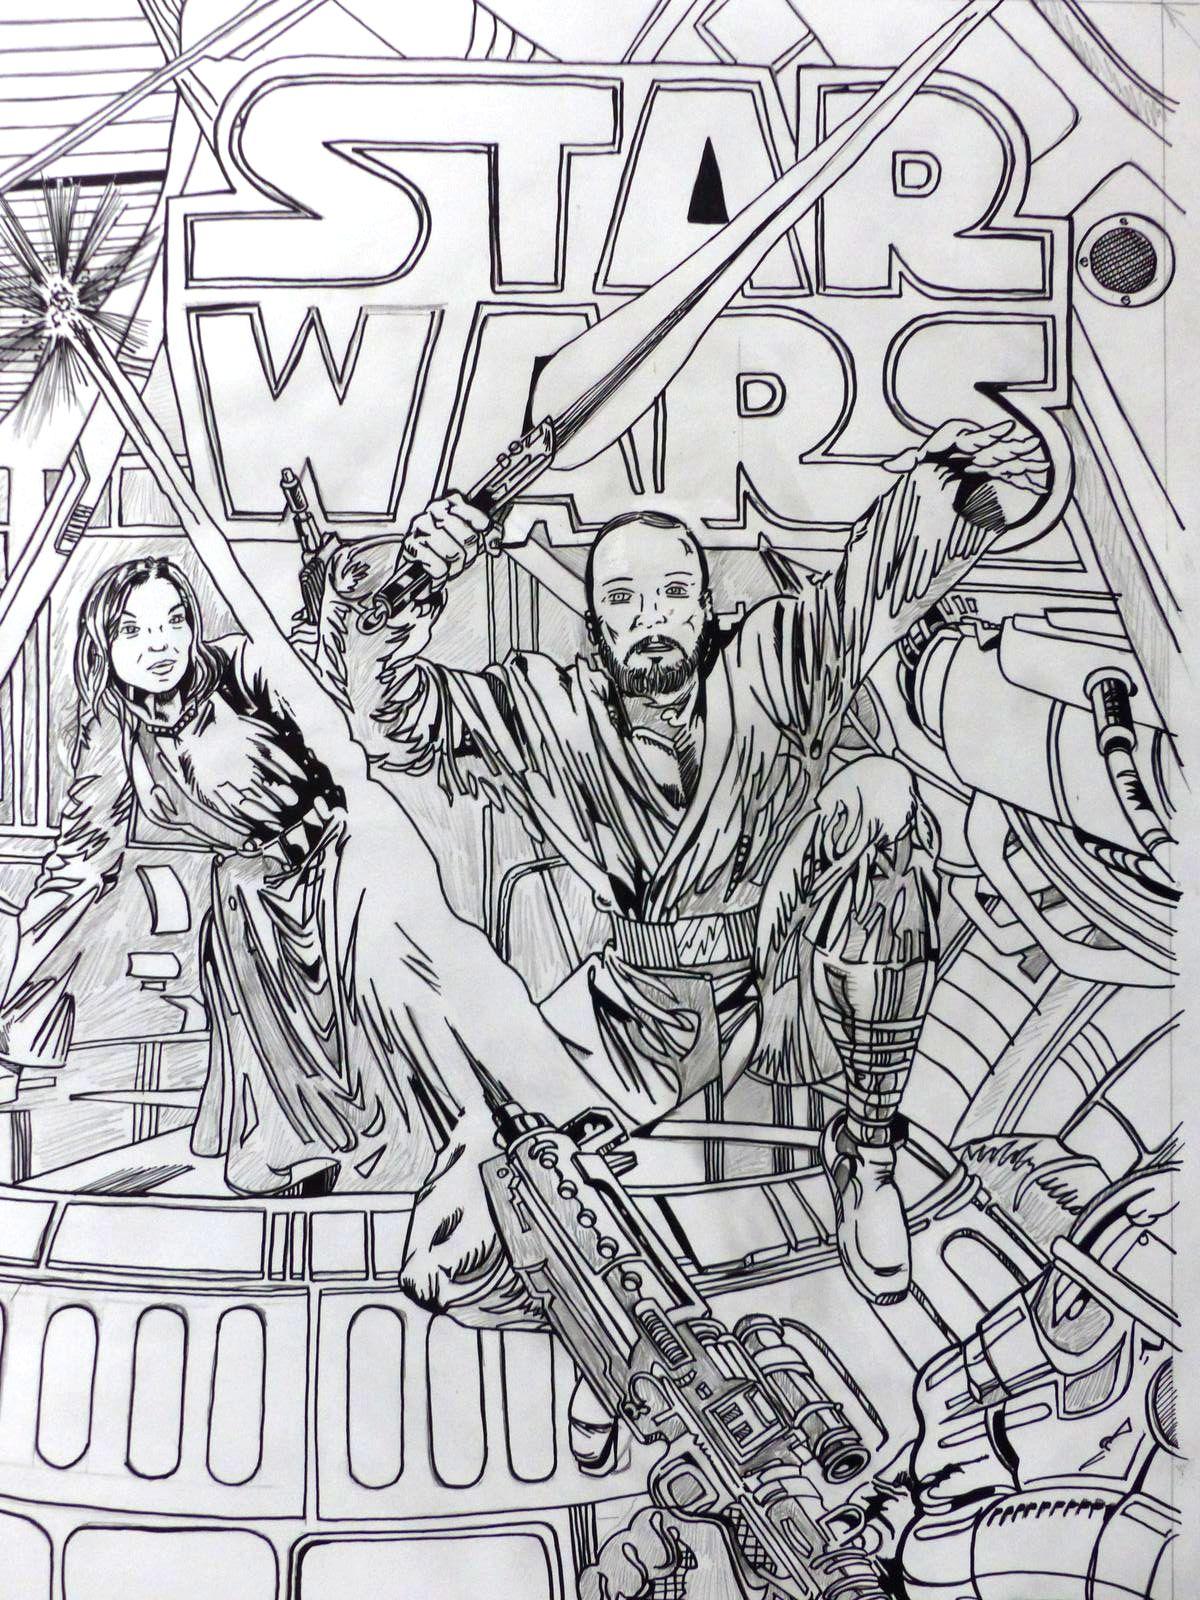 Commission dessin Star Wars   ORTEGA Mariano - Dessinateur / penciler - Tarn